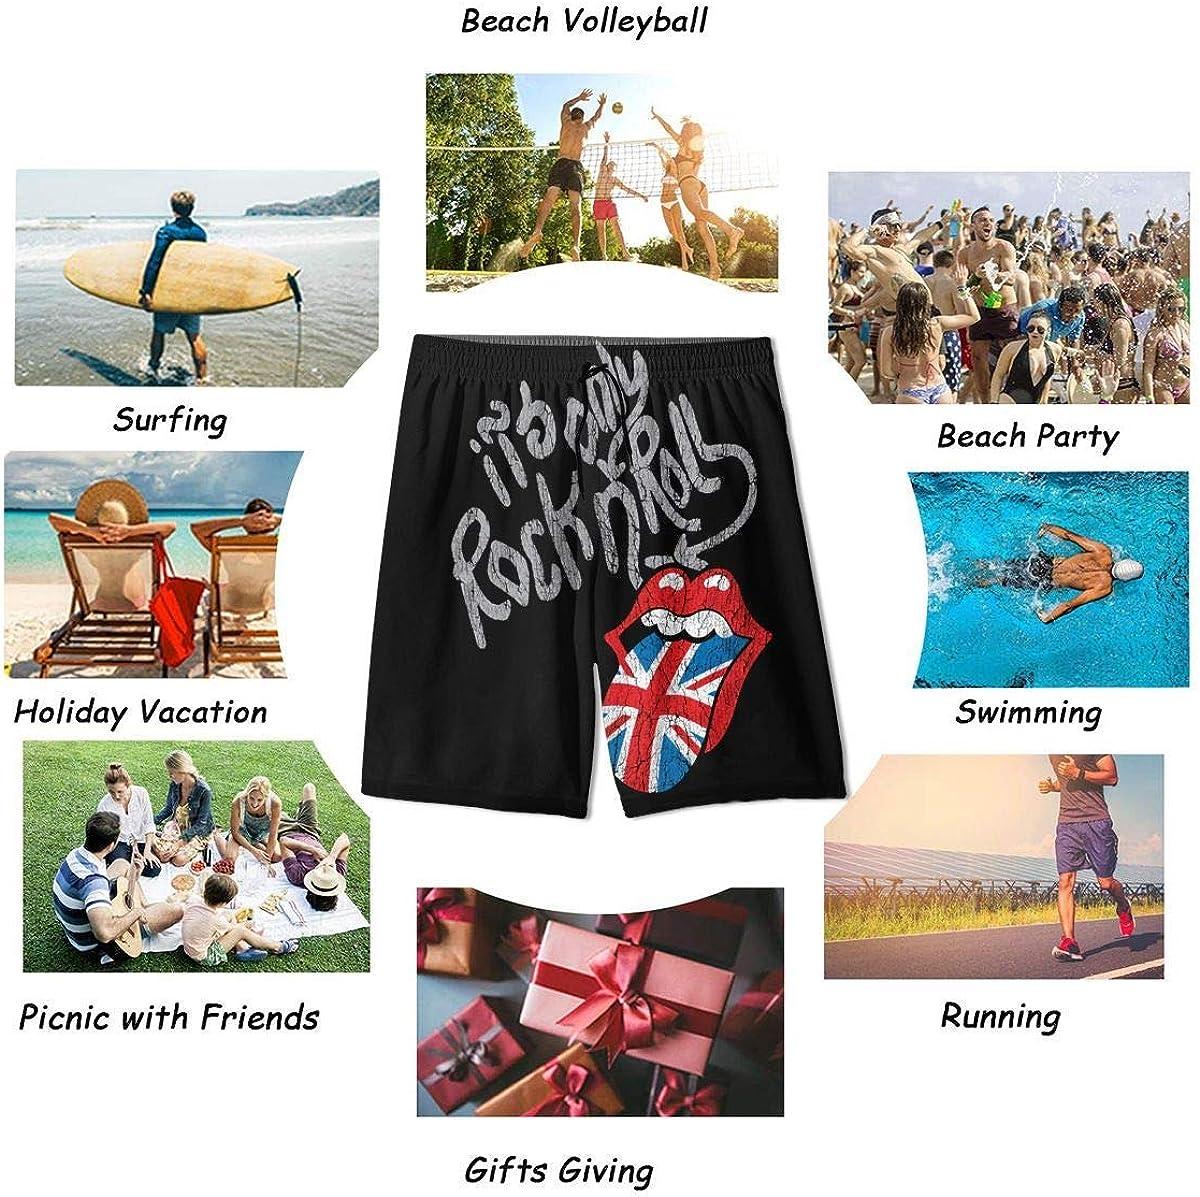 Quick Dry Swimwear RTRTRT 2020 Rol-ling Stones Slim Fit Badehose Beach Half Pants f/ür Teenager-Jungen